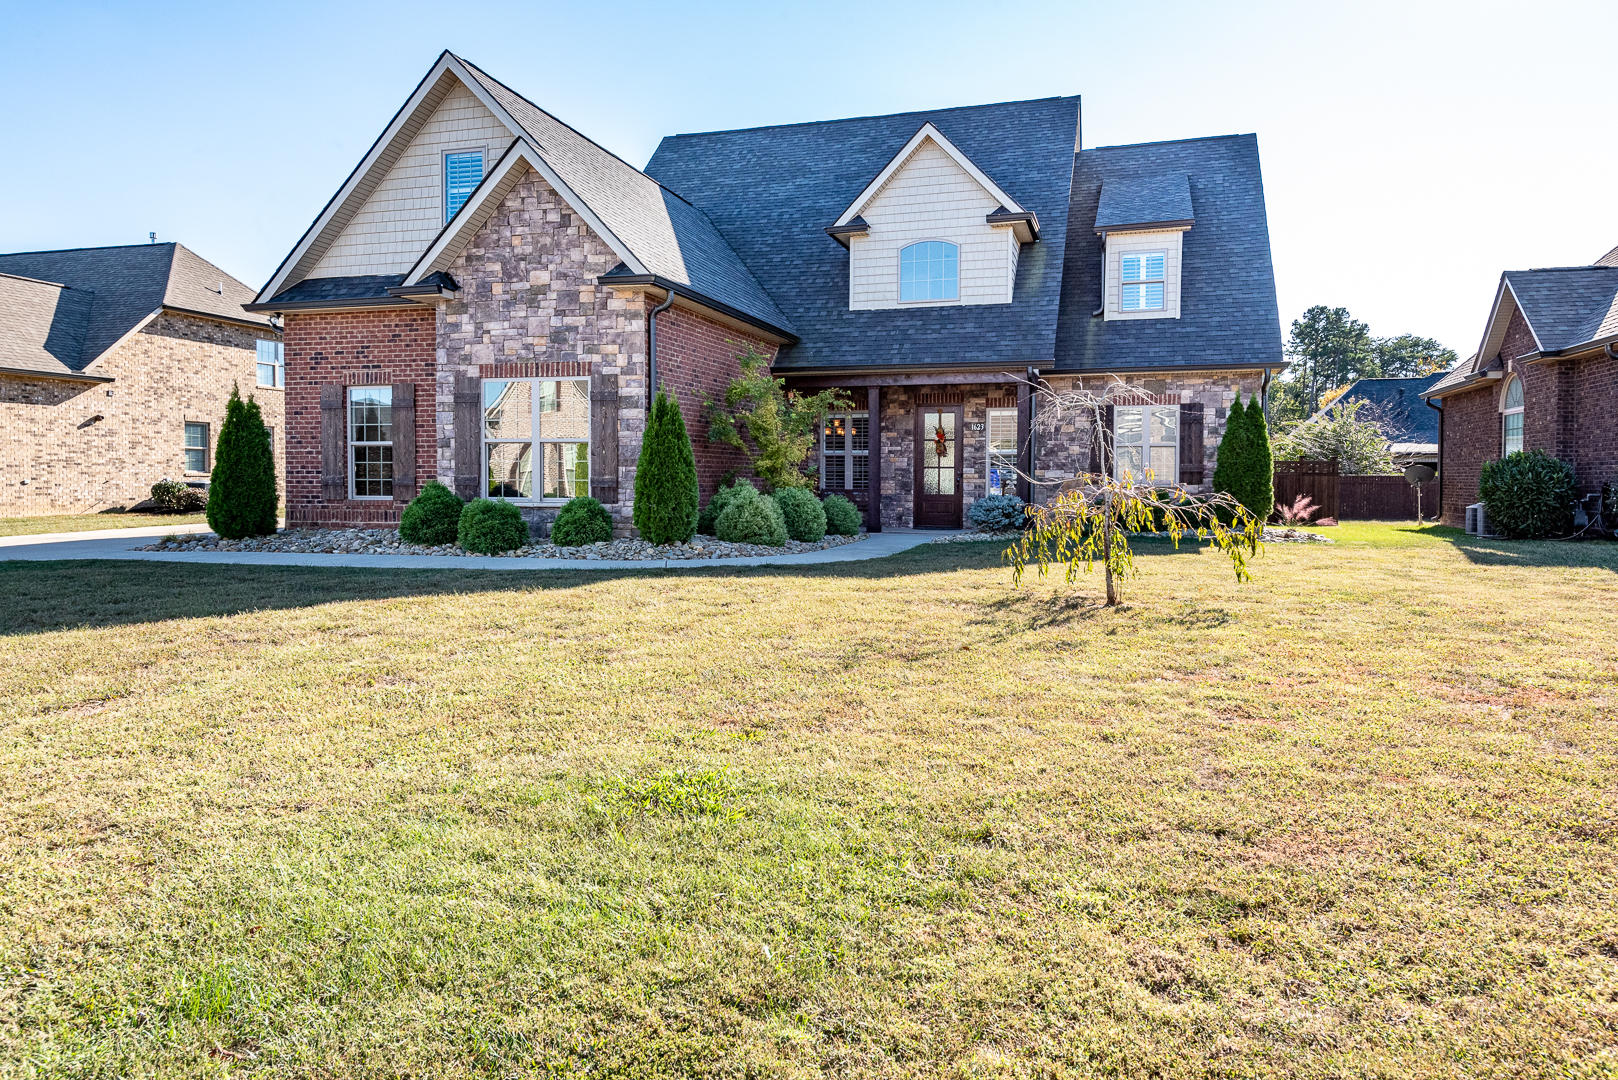 1623 Amhurst, Maryville, Tennessee, United States 37801, 4 Bedrooms Bedrooms, ,2 BathroomsBathrooms,Single Family,For Sale,Amhurst,1098270